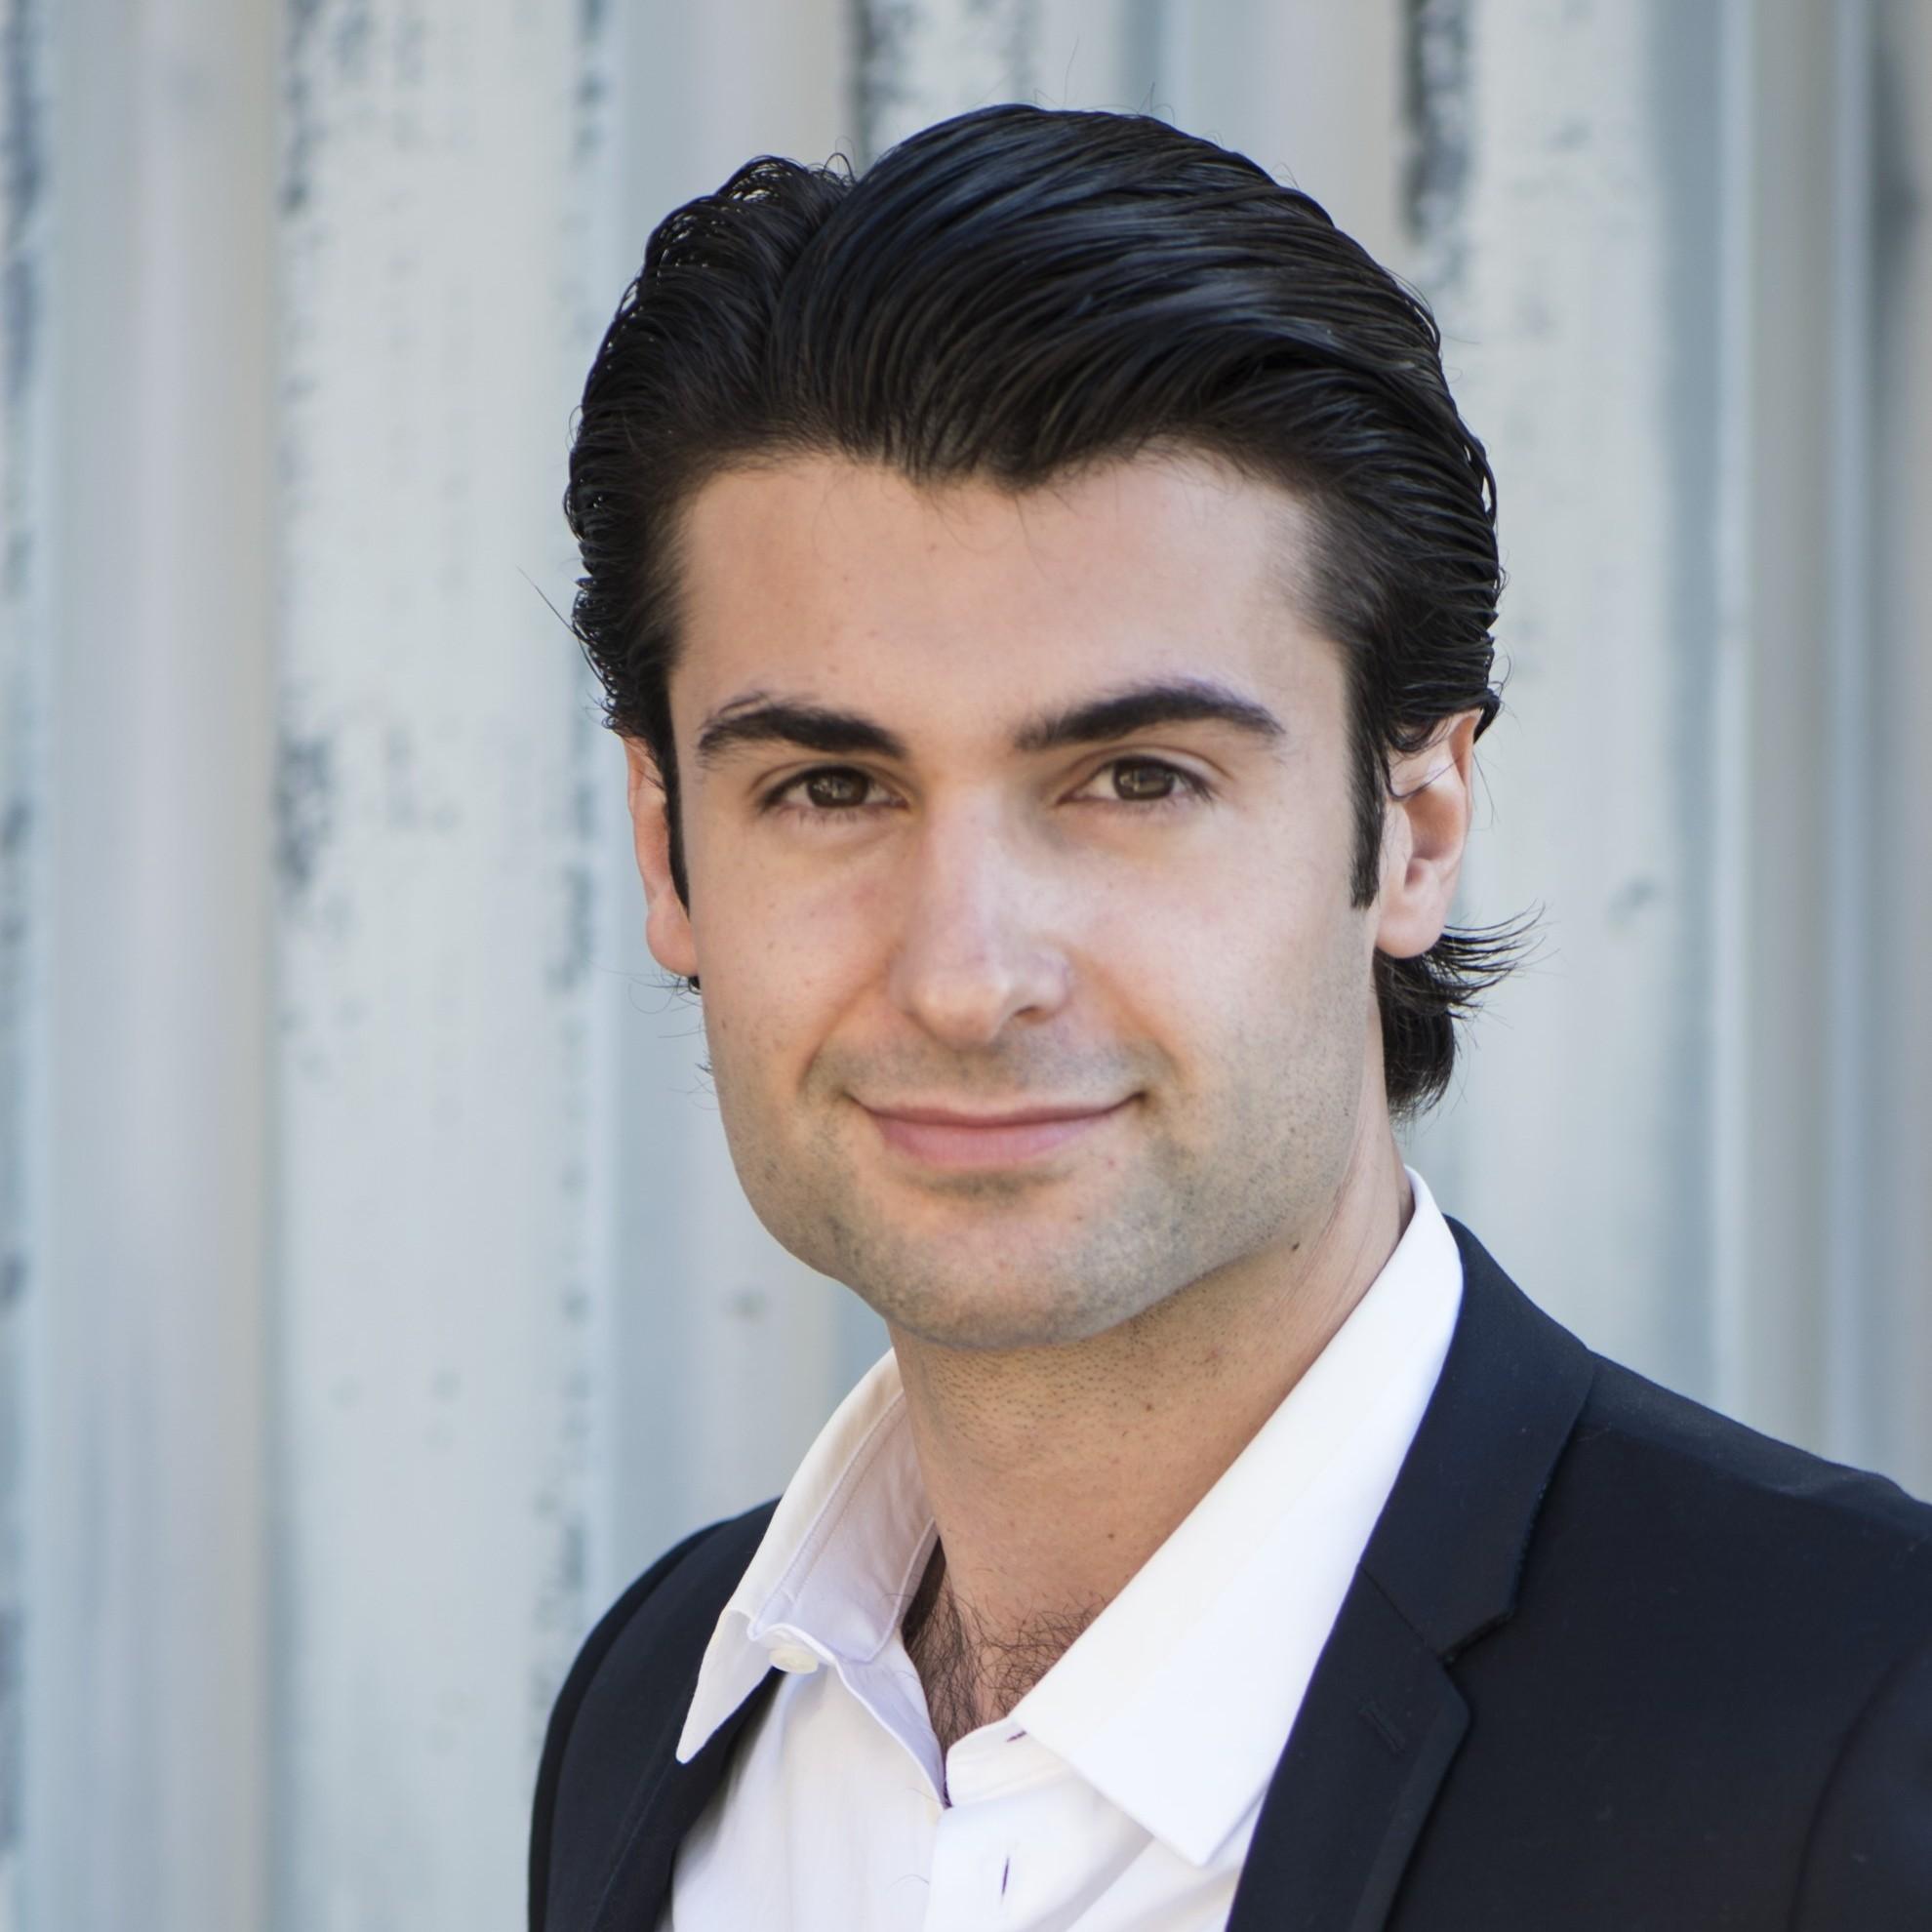 Photo of Nicholas Flanders